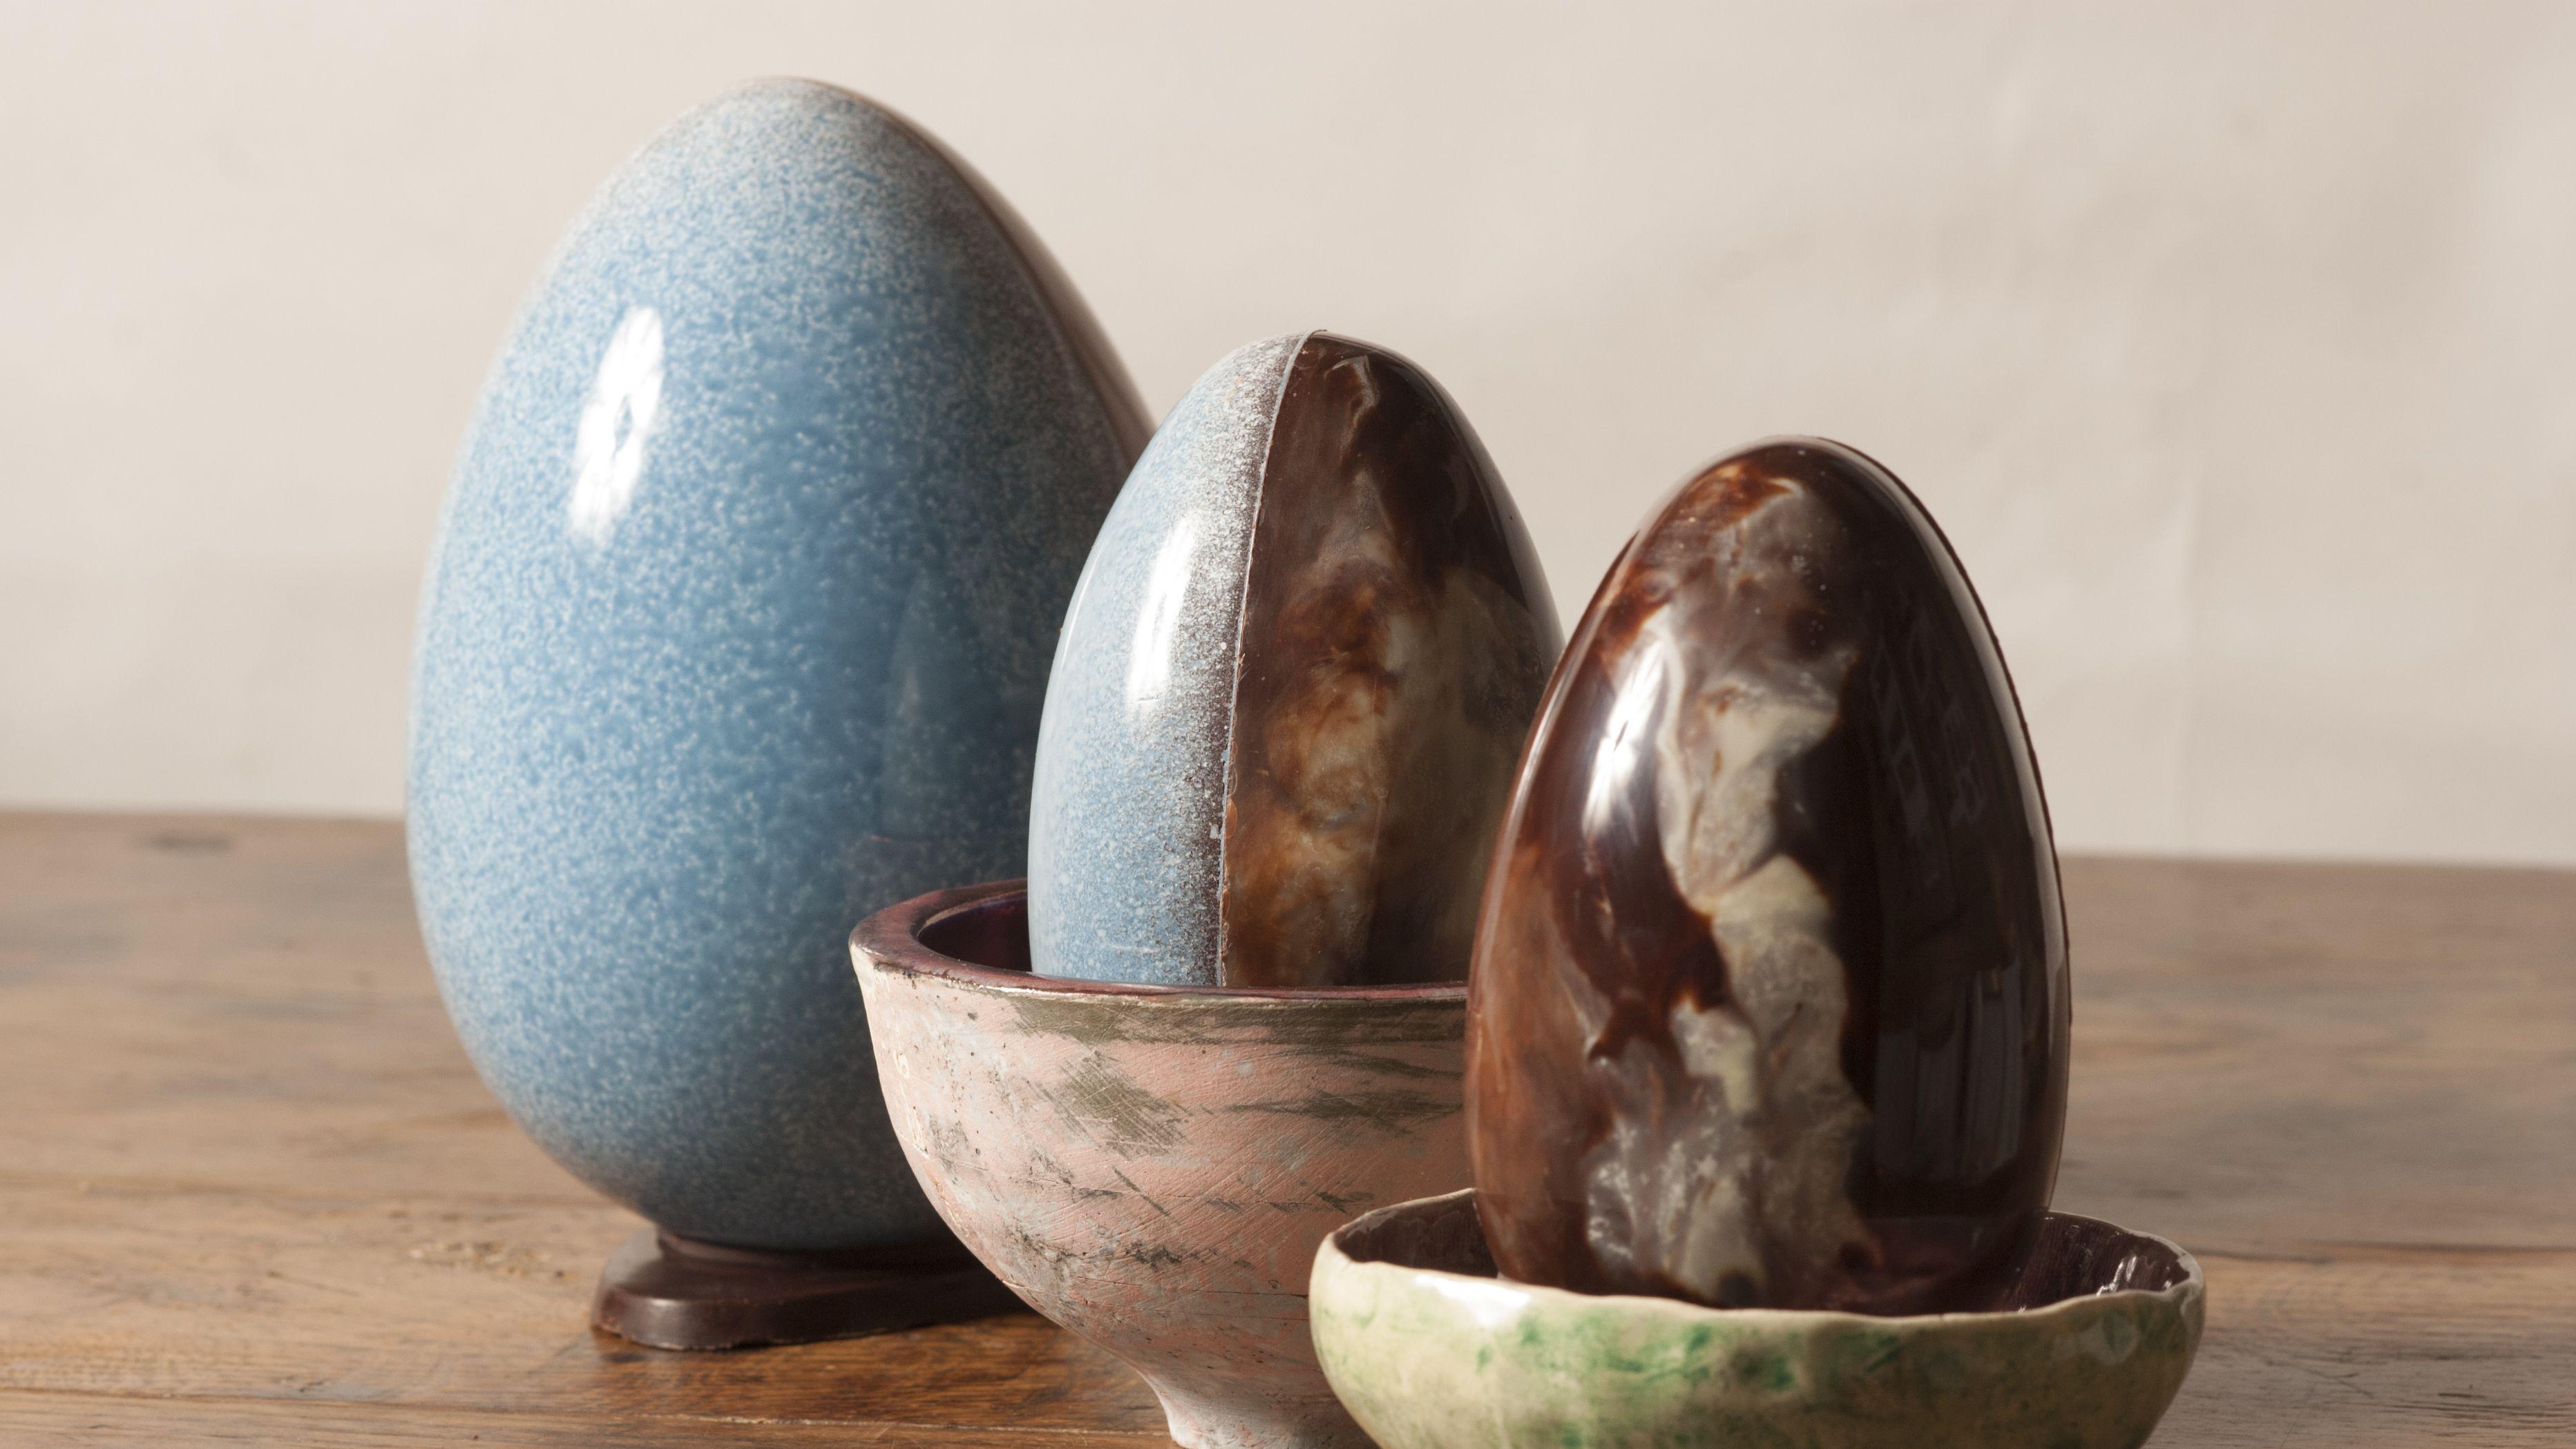 Crack on Where to order an Irish artisanal Easter egg in time for ...